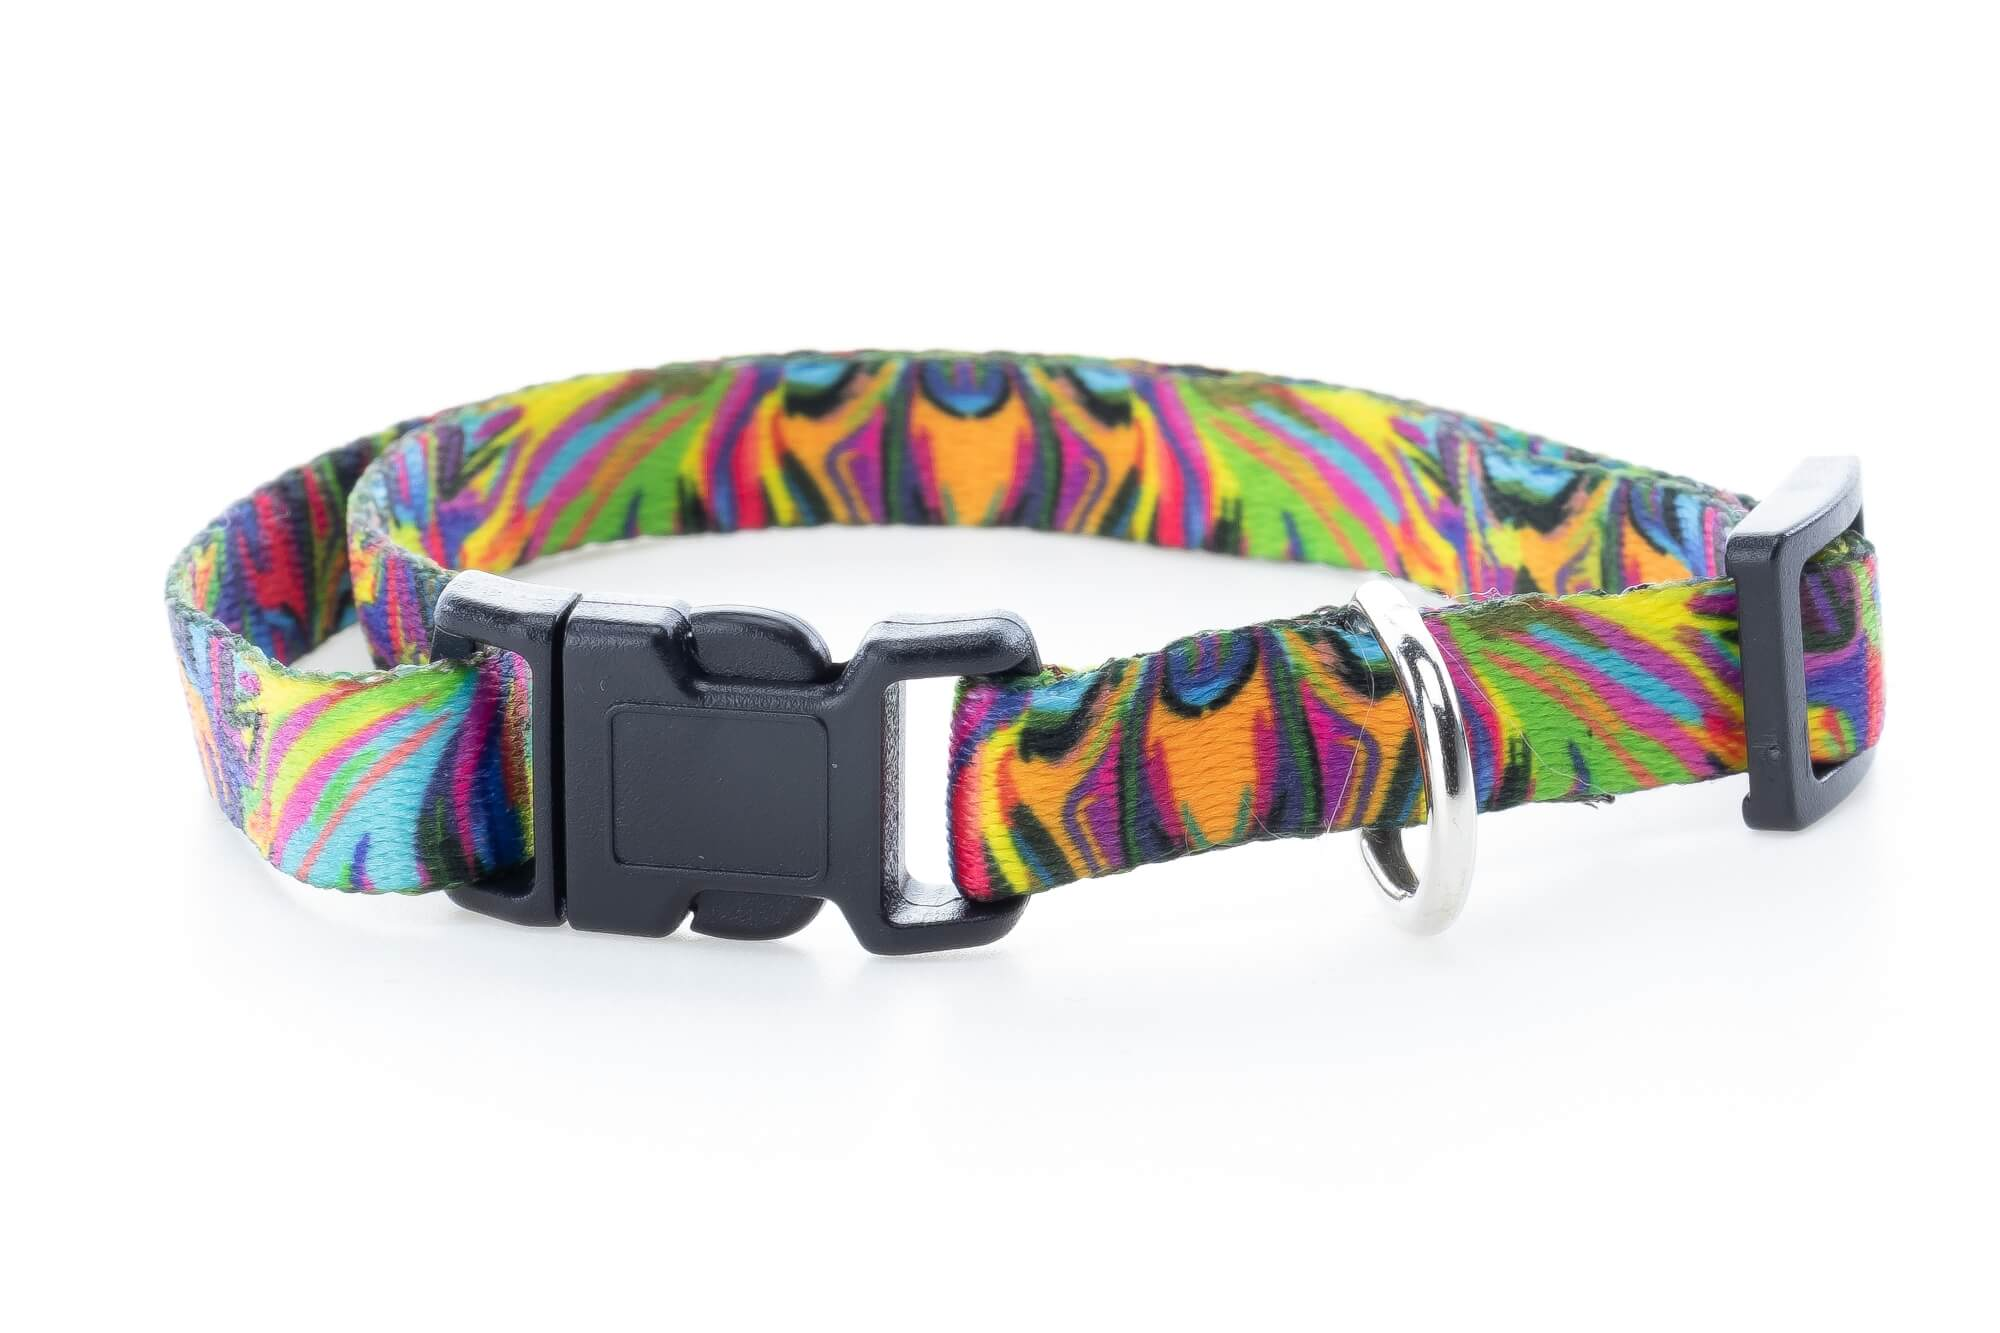 Vsepropejska Manet obojek pro psa | 22 - 38 cm Barva: Černá